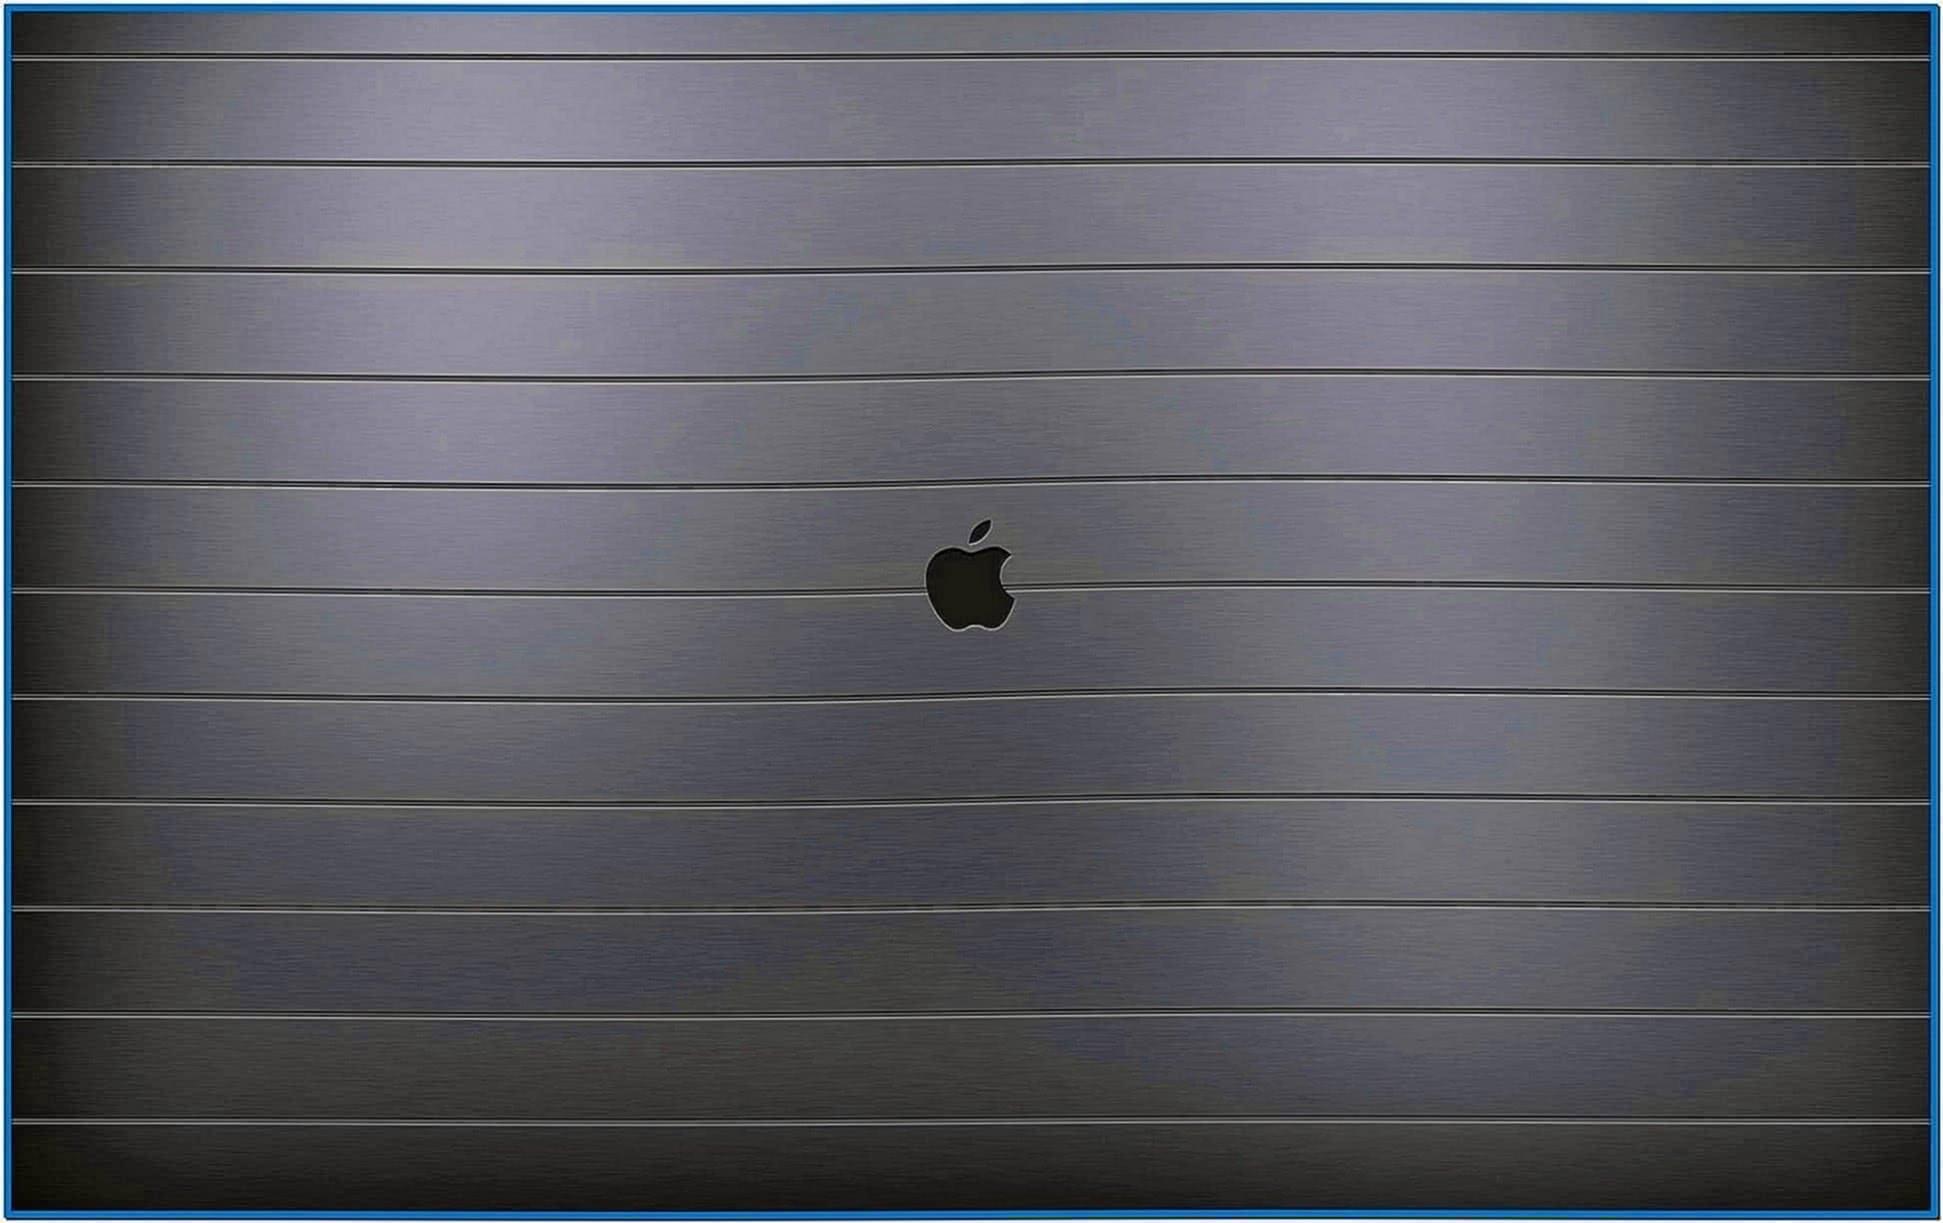 Screensavers for MacBook Pro